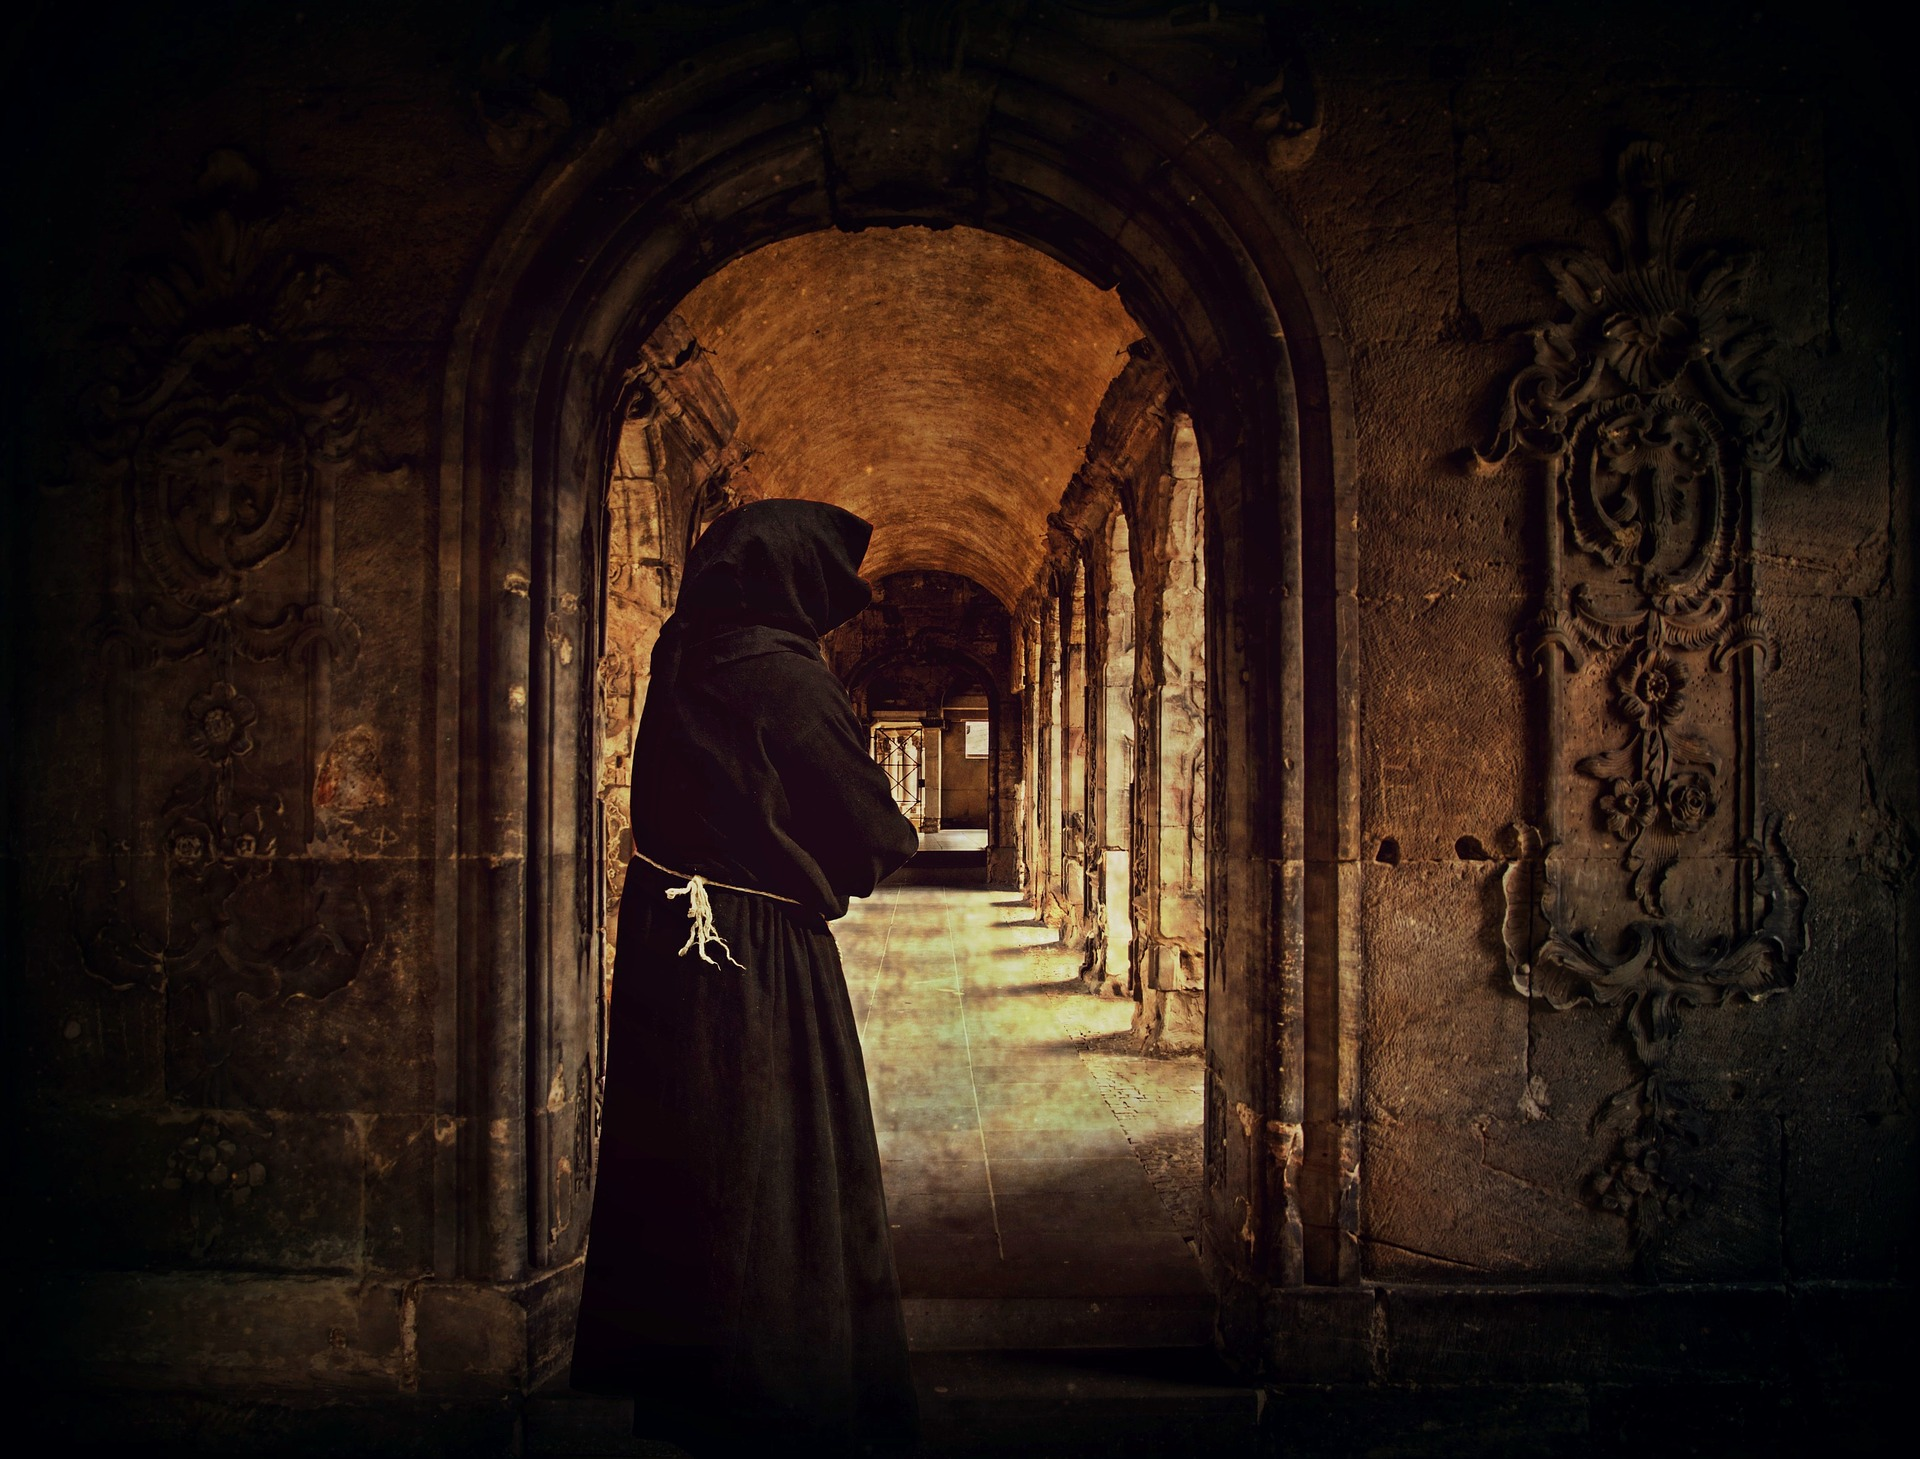 Religious person in Monastery